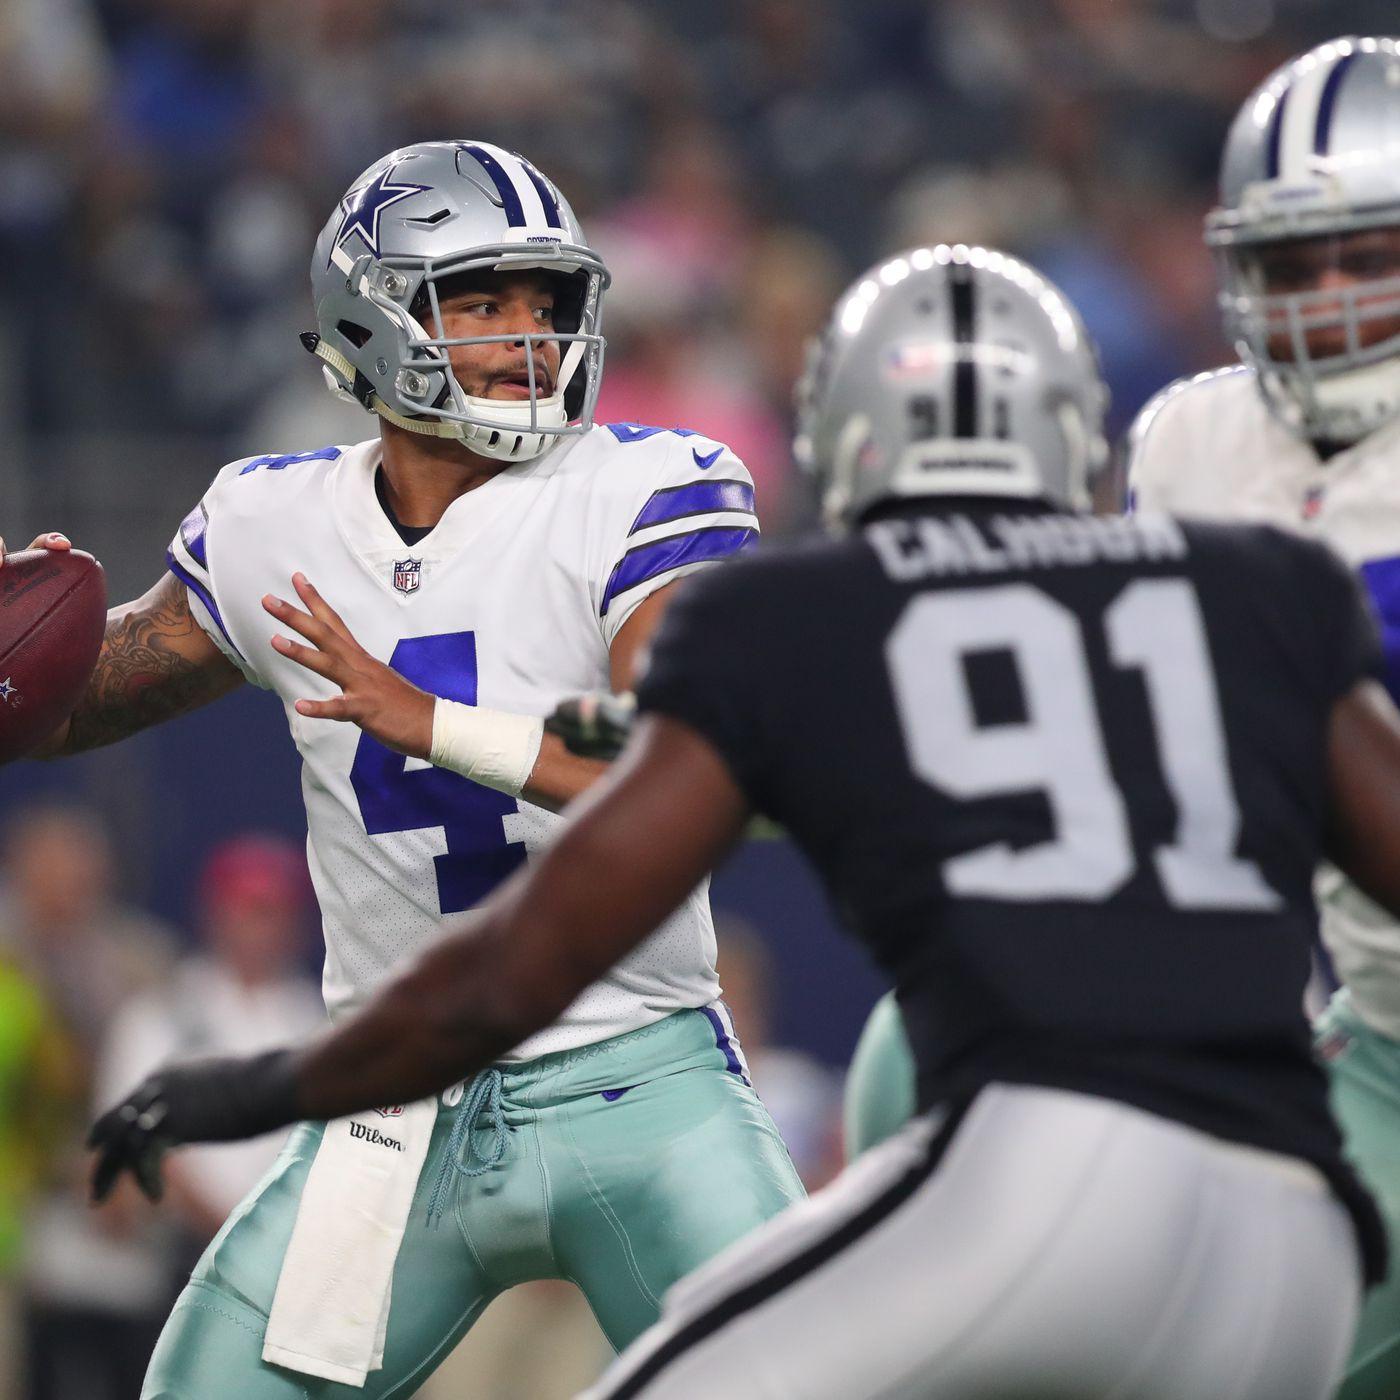 NFL week 15 odds, betting lines: Cowboys 3-point favorites